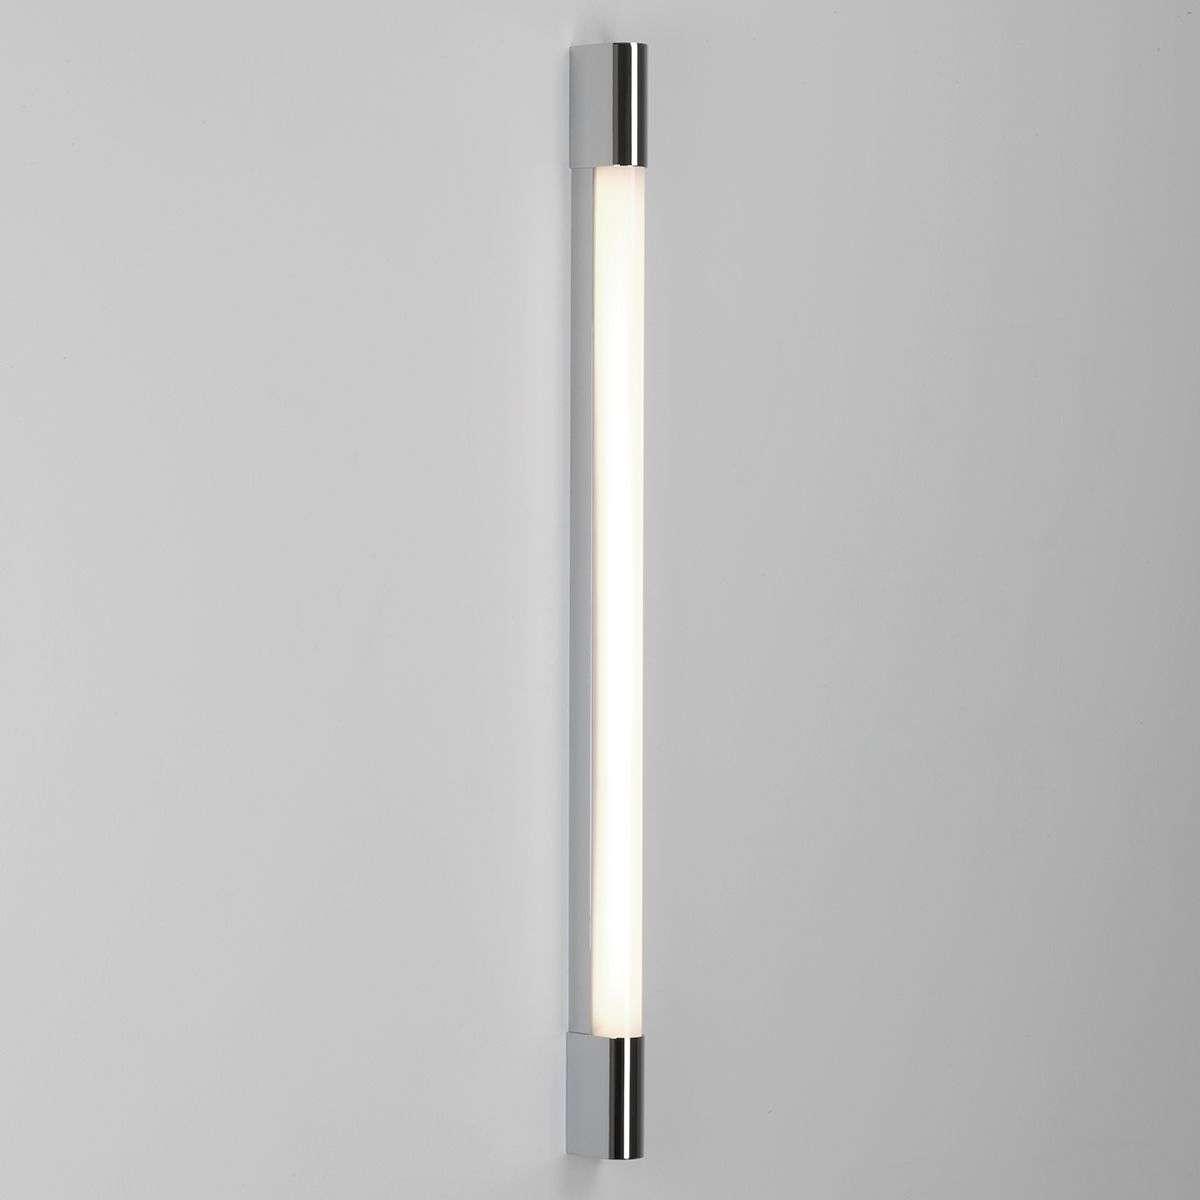 Palermo Wall Light Elegant 90 cm 39 W-1020043-33